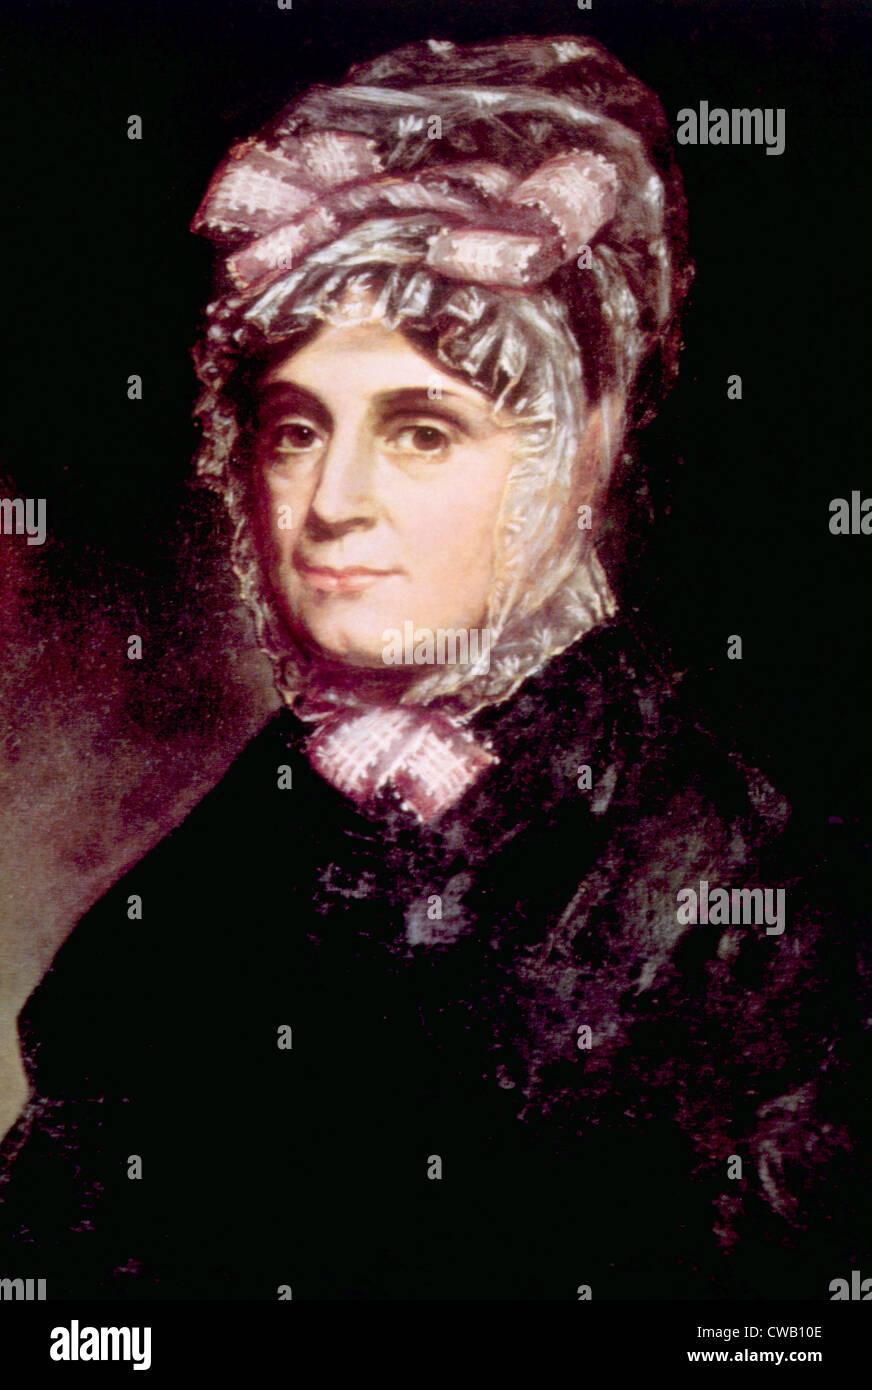 Anna Harrison (1775-1864), First Lady 1841, portrait by Cornelia Stuart Cassady, 1843 - Stock Image